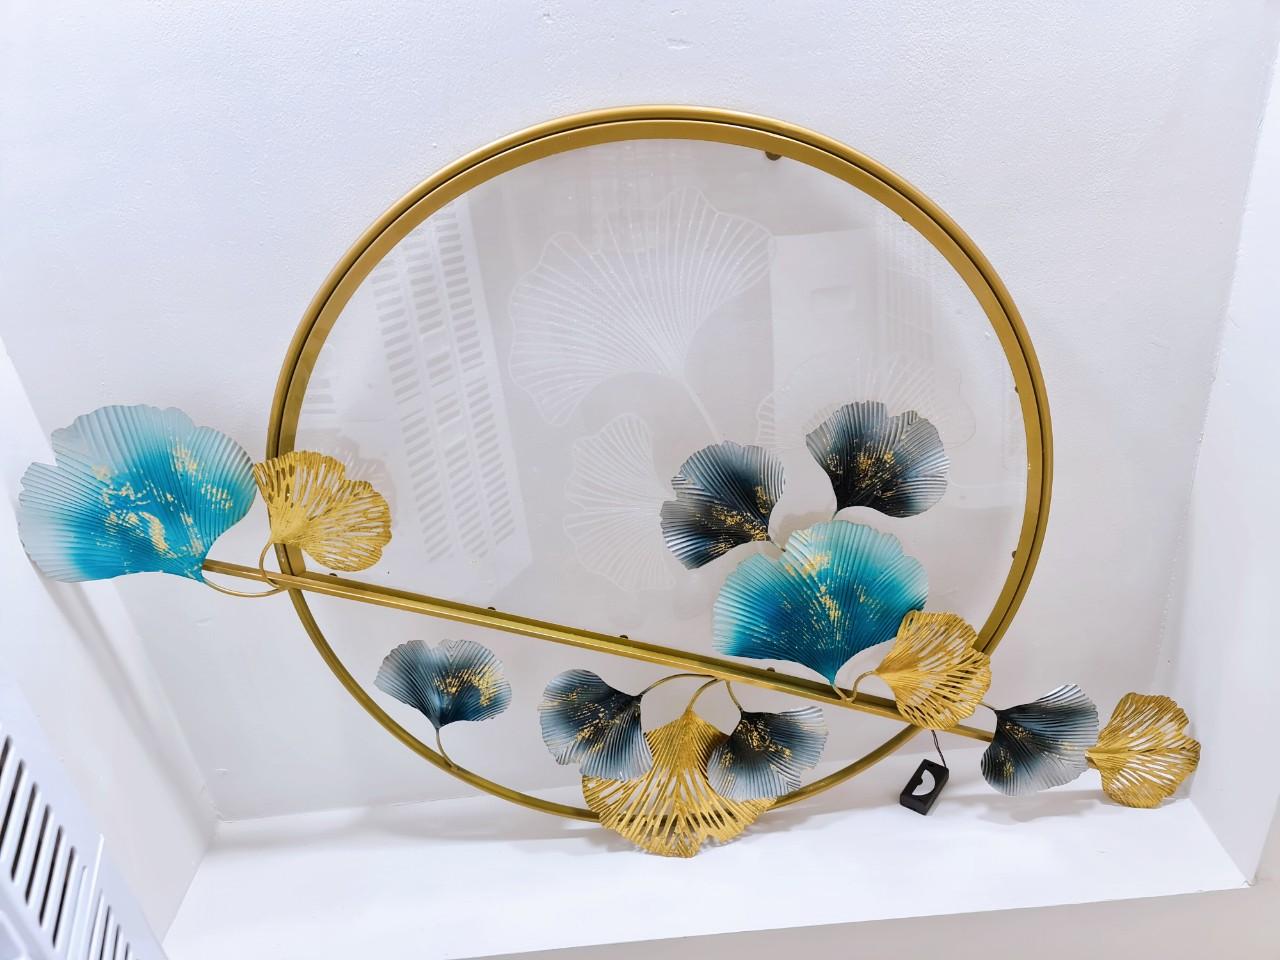 tranh-decor-tron-la-xanh-vang-mat-mika